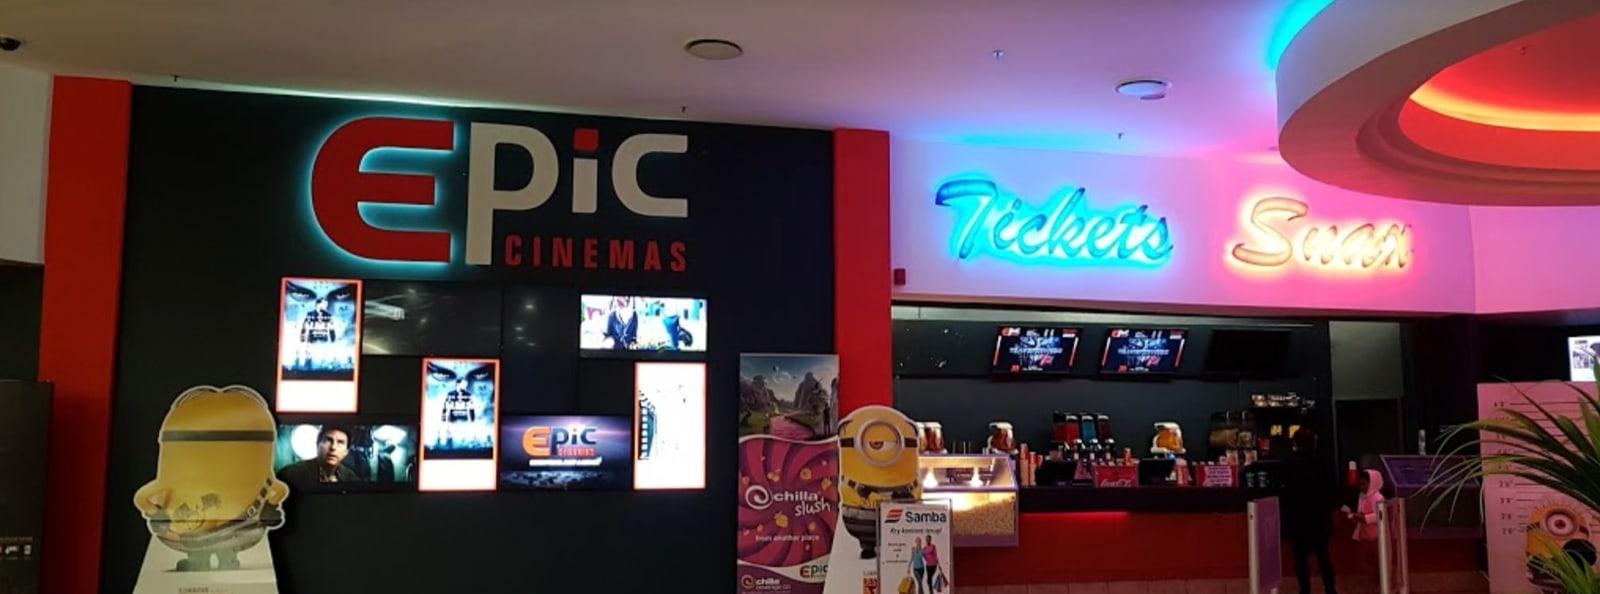 Mall@Reds Epic Cinemas